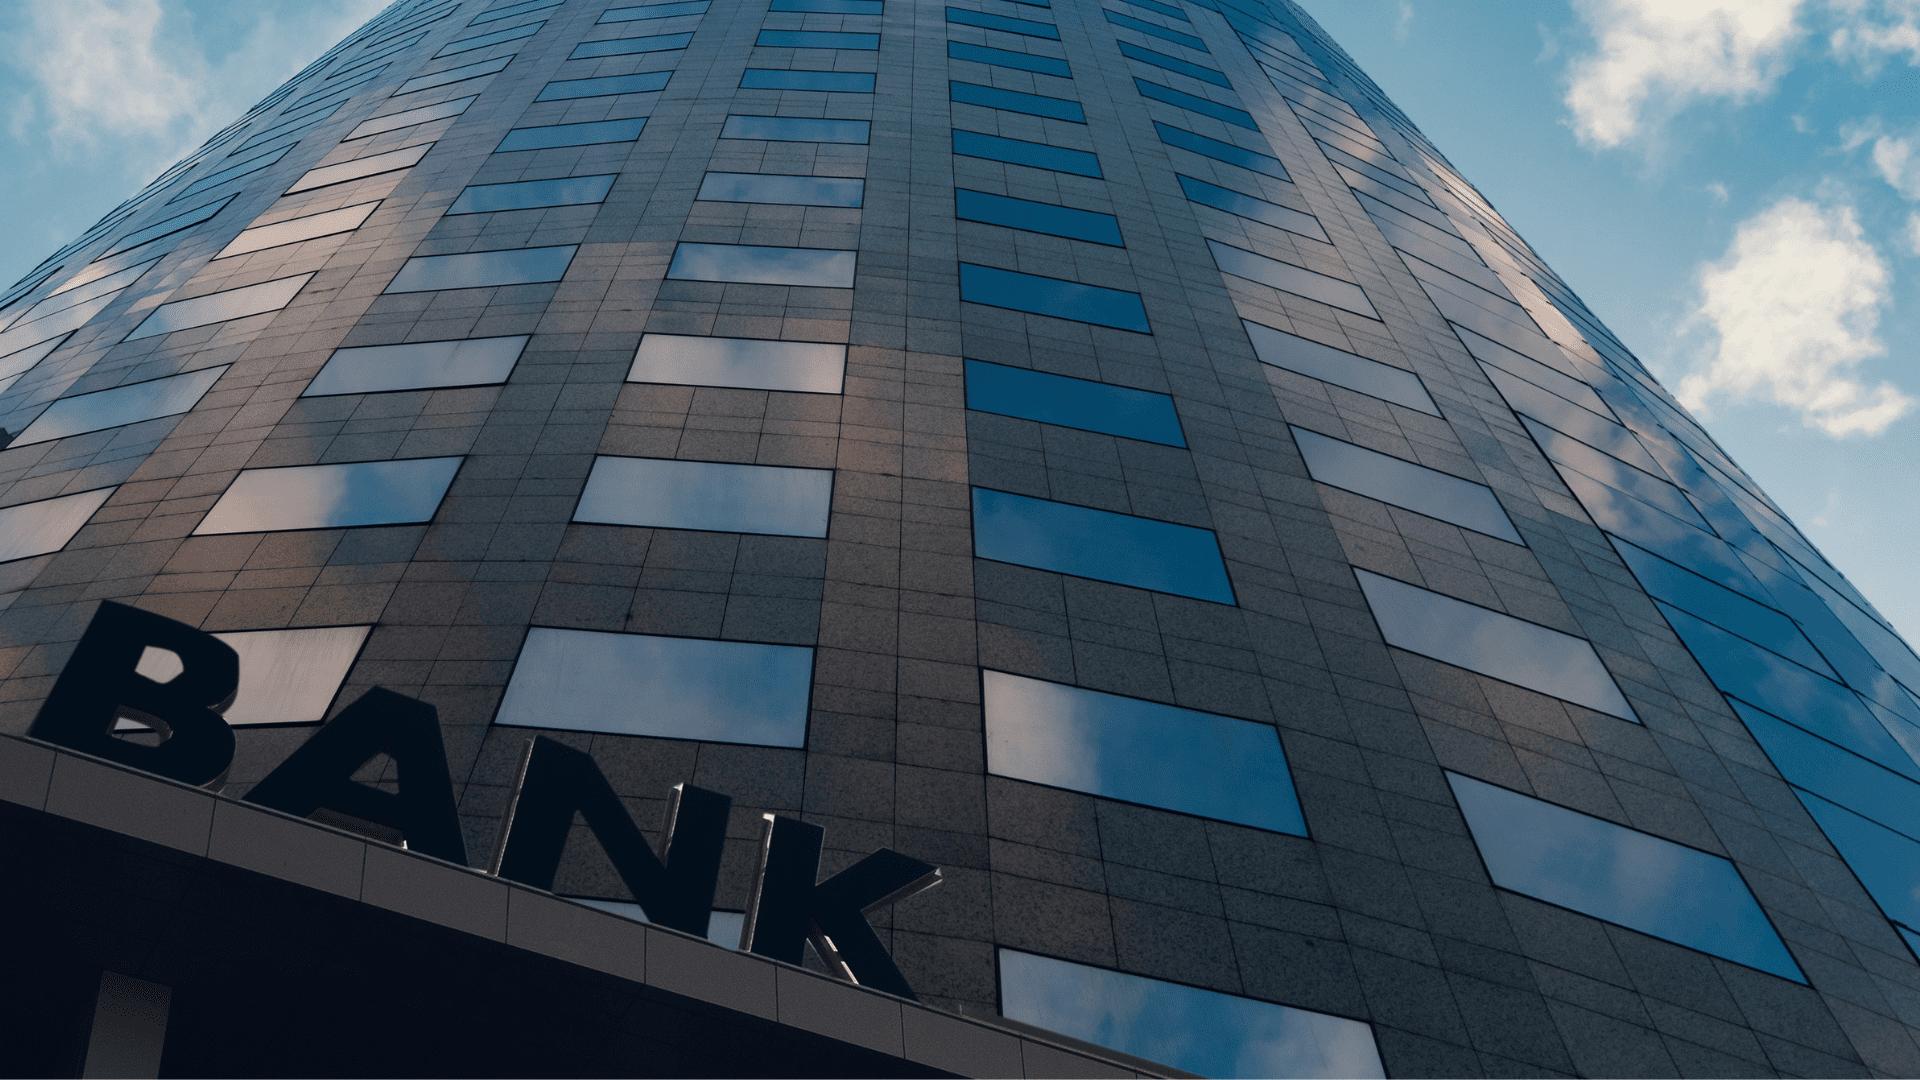 UNIQUE INSURANCE EXPOSURES FOR BANKS